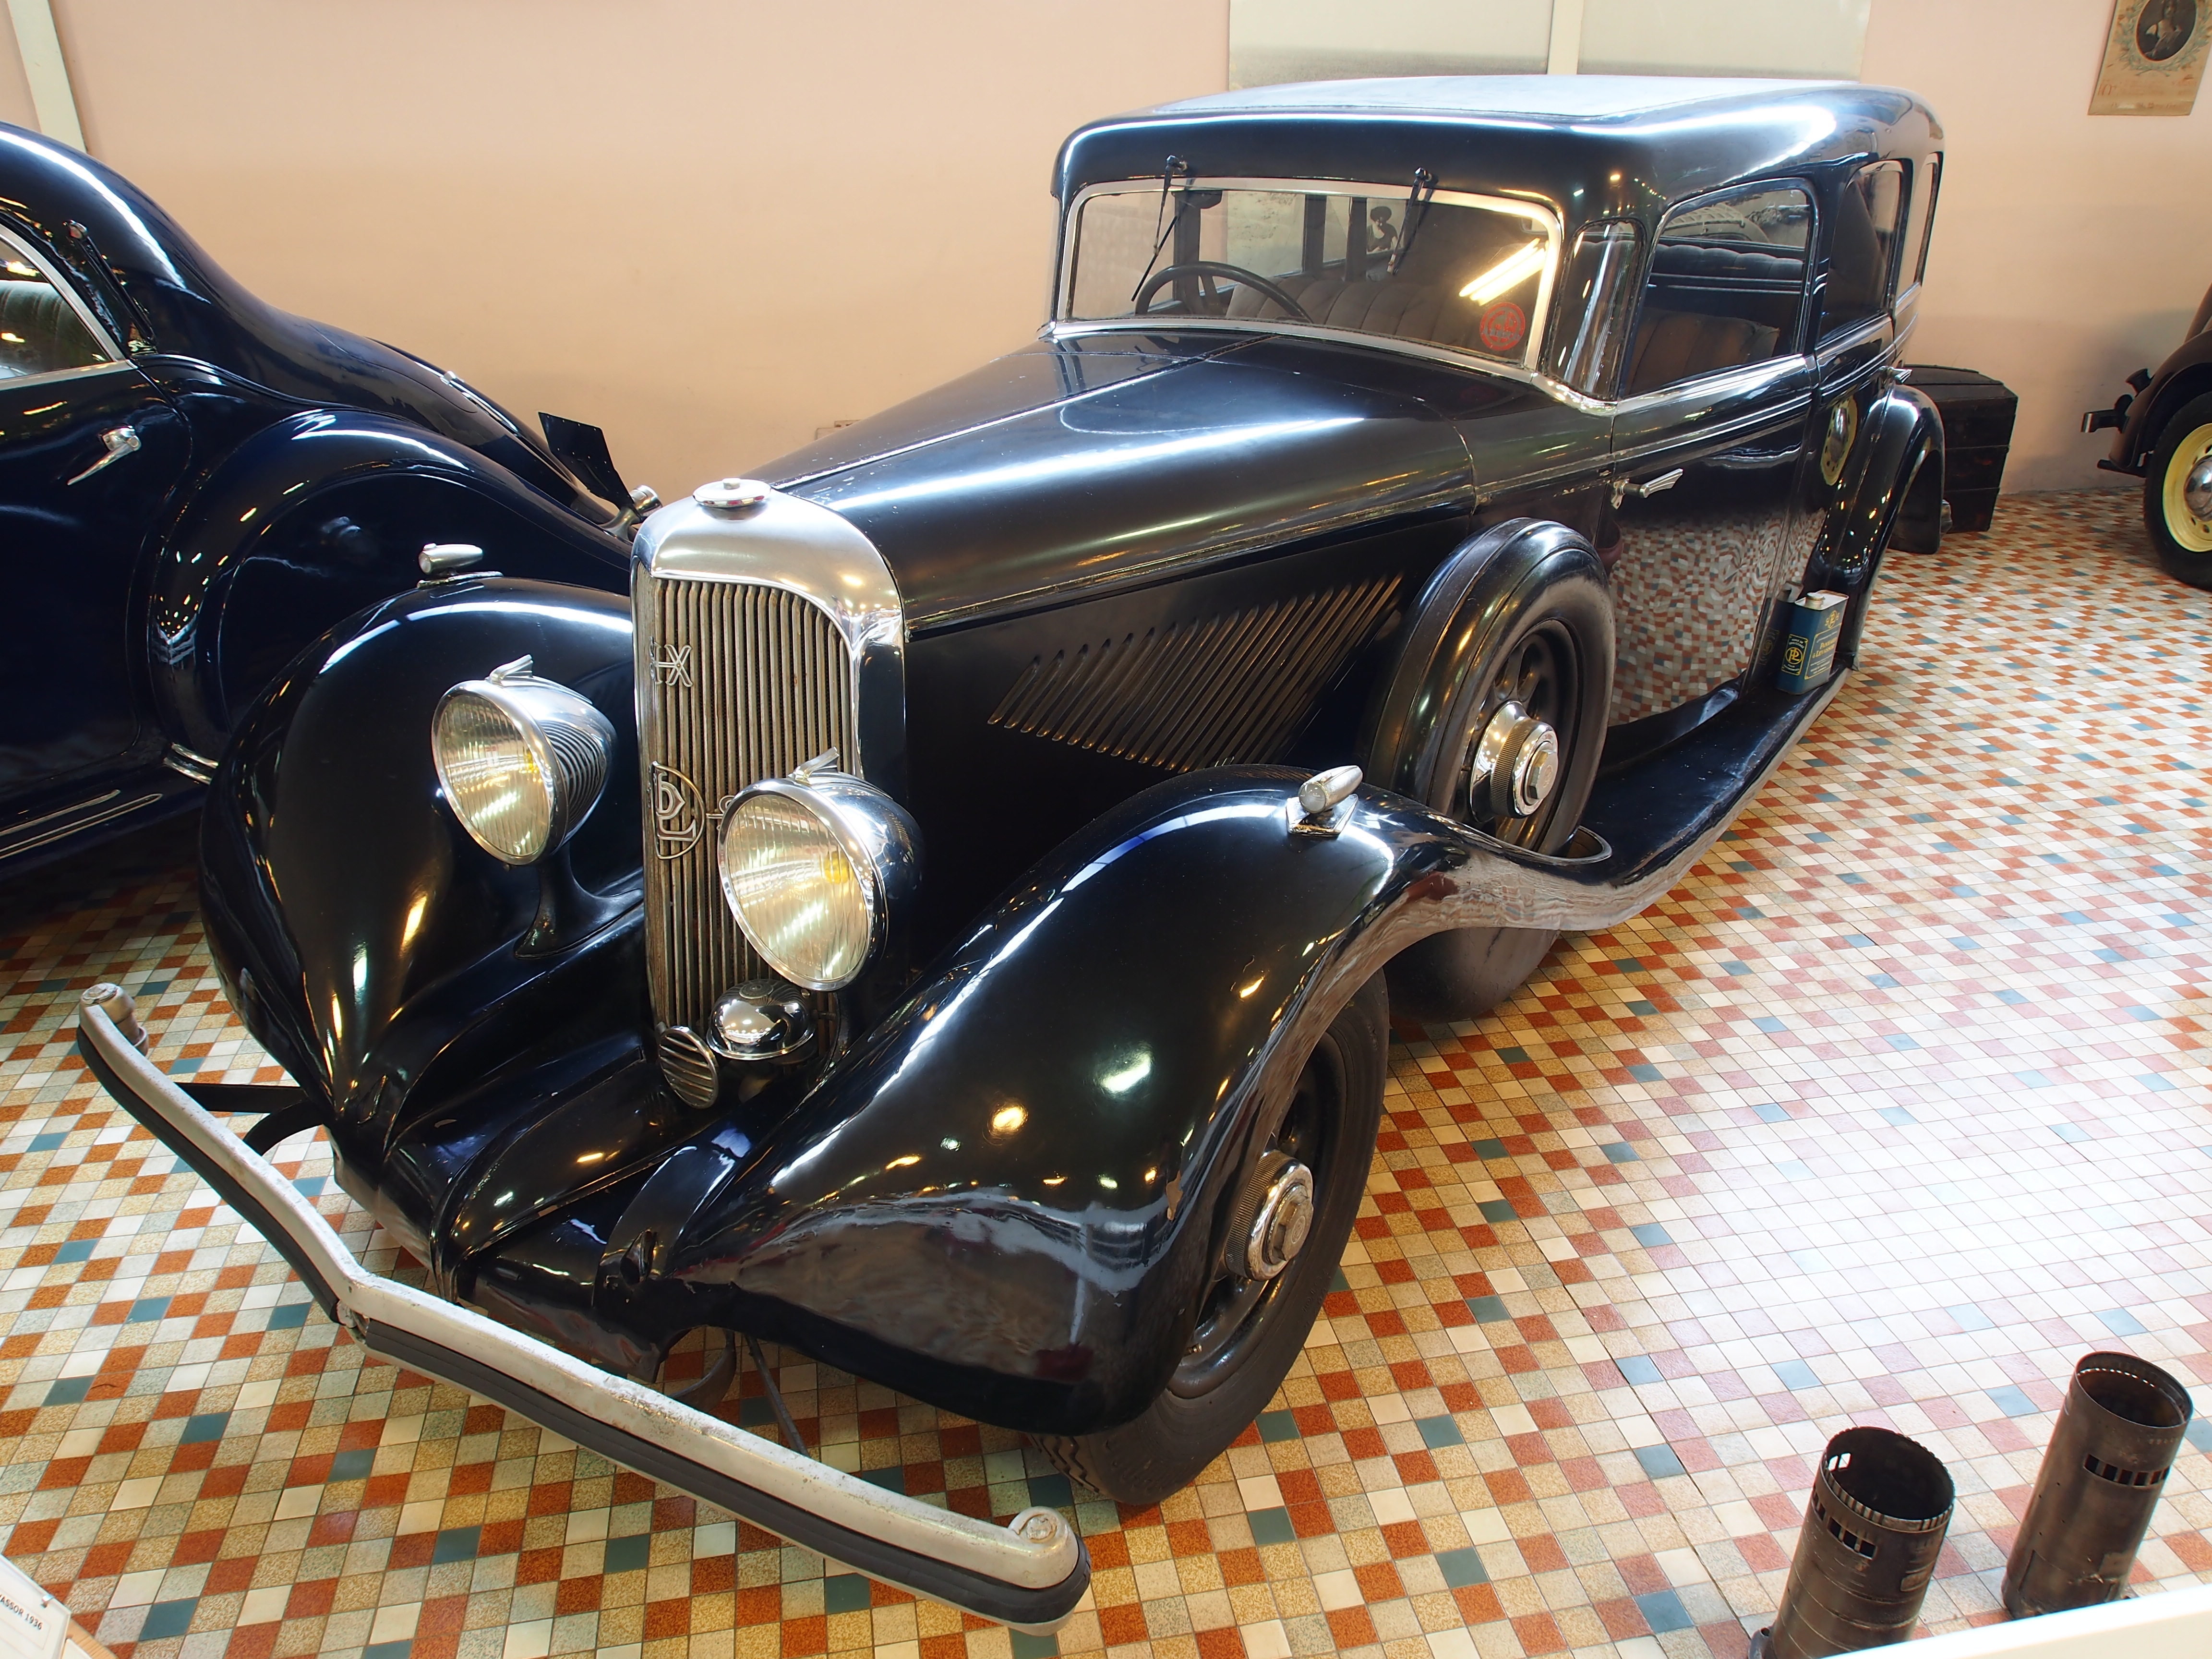 file 1936 panhard levassor x72 panoramique at the mus e. Black Bedroom Furniture Sets. Home Design Ideas